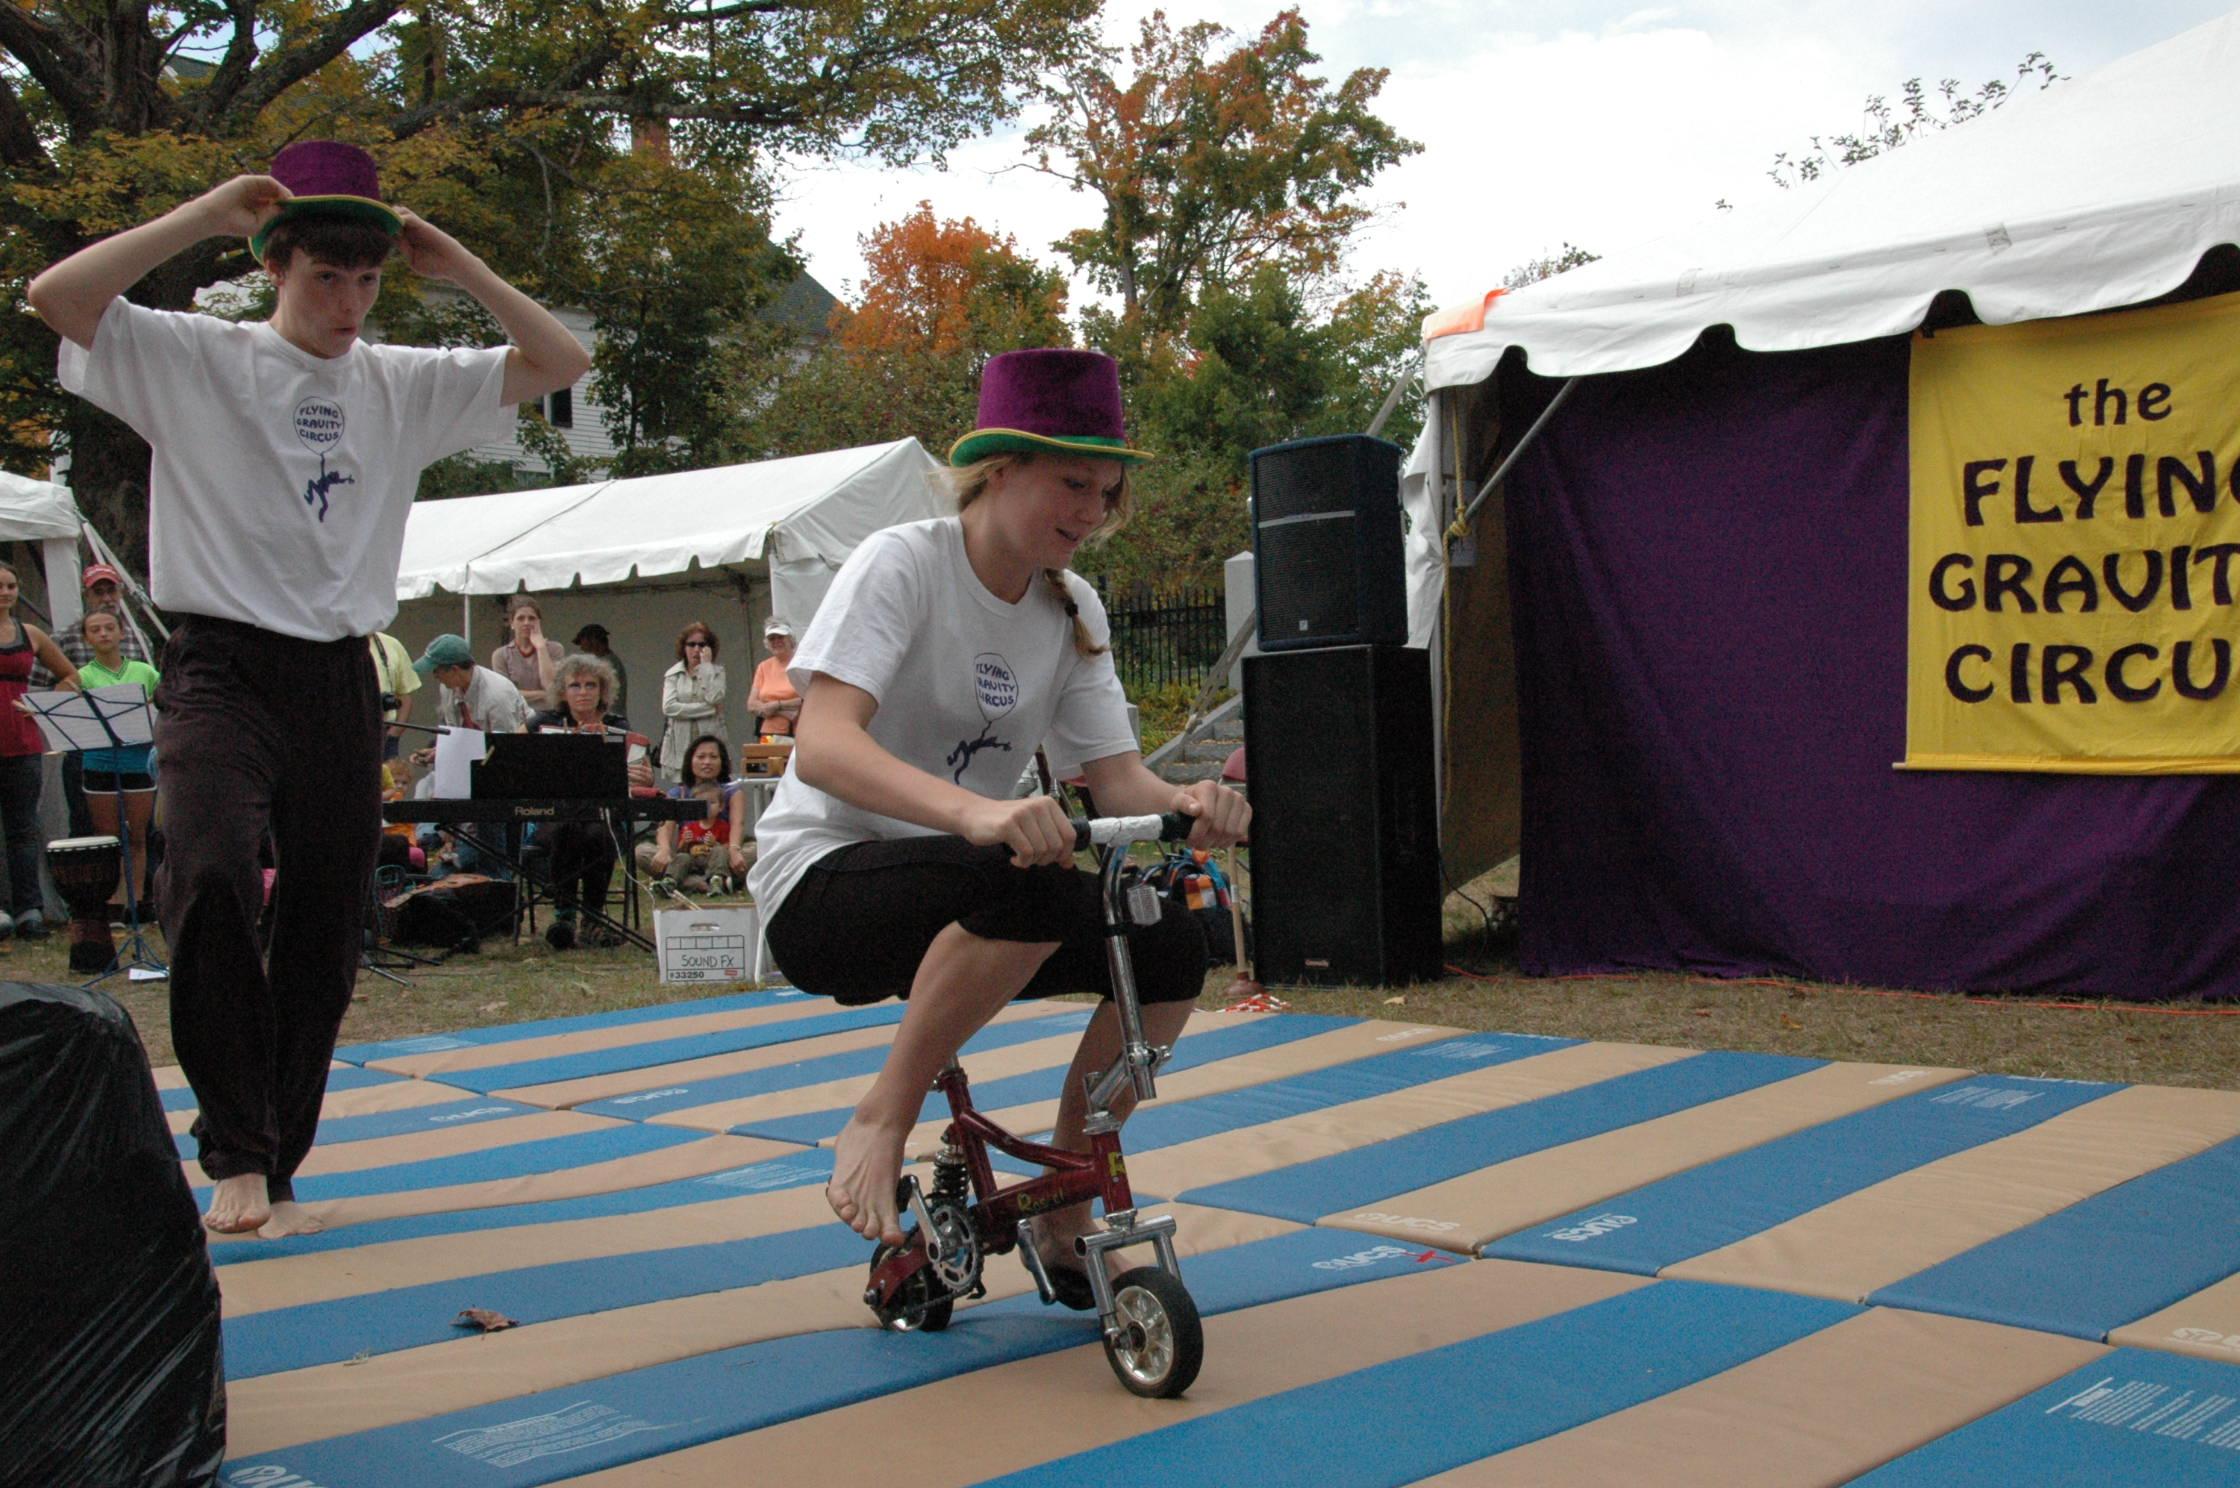 2012-10-06 Flyin Gravity Circus - Pumpkin 096.JPG